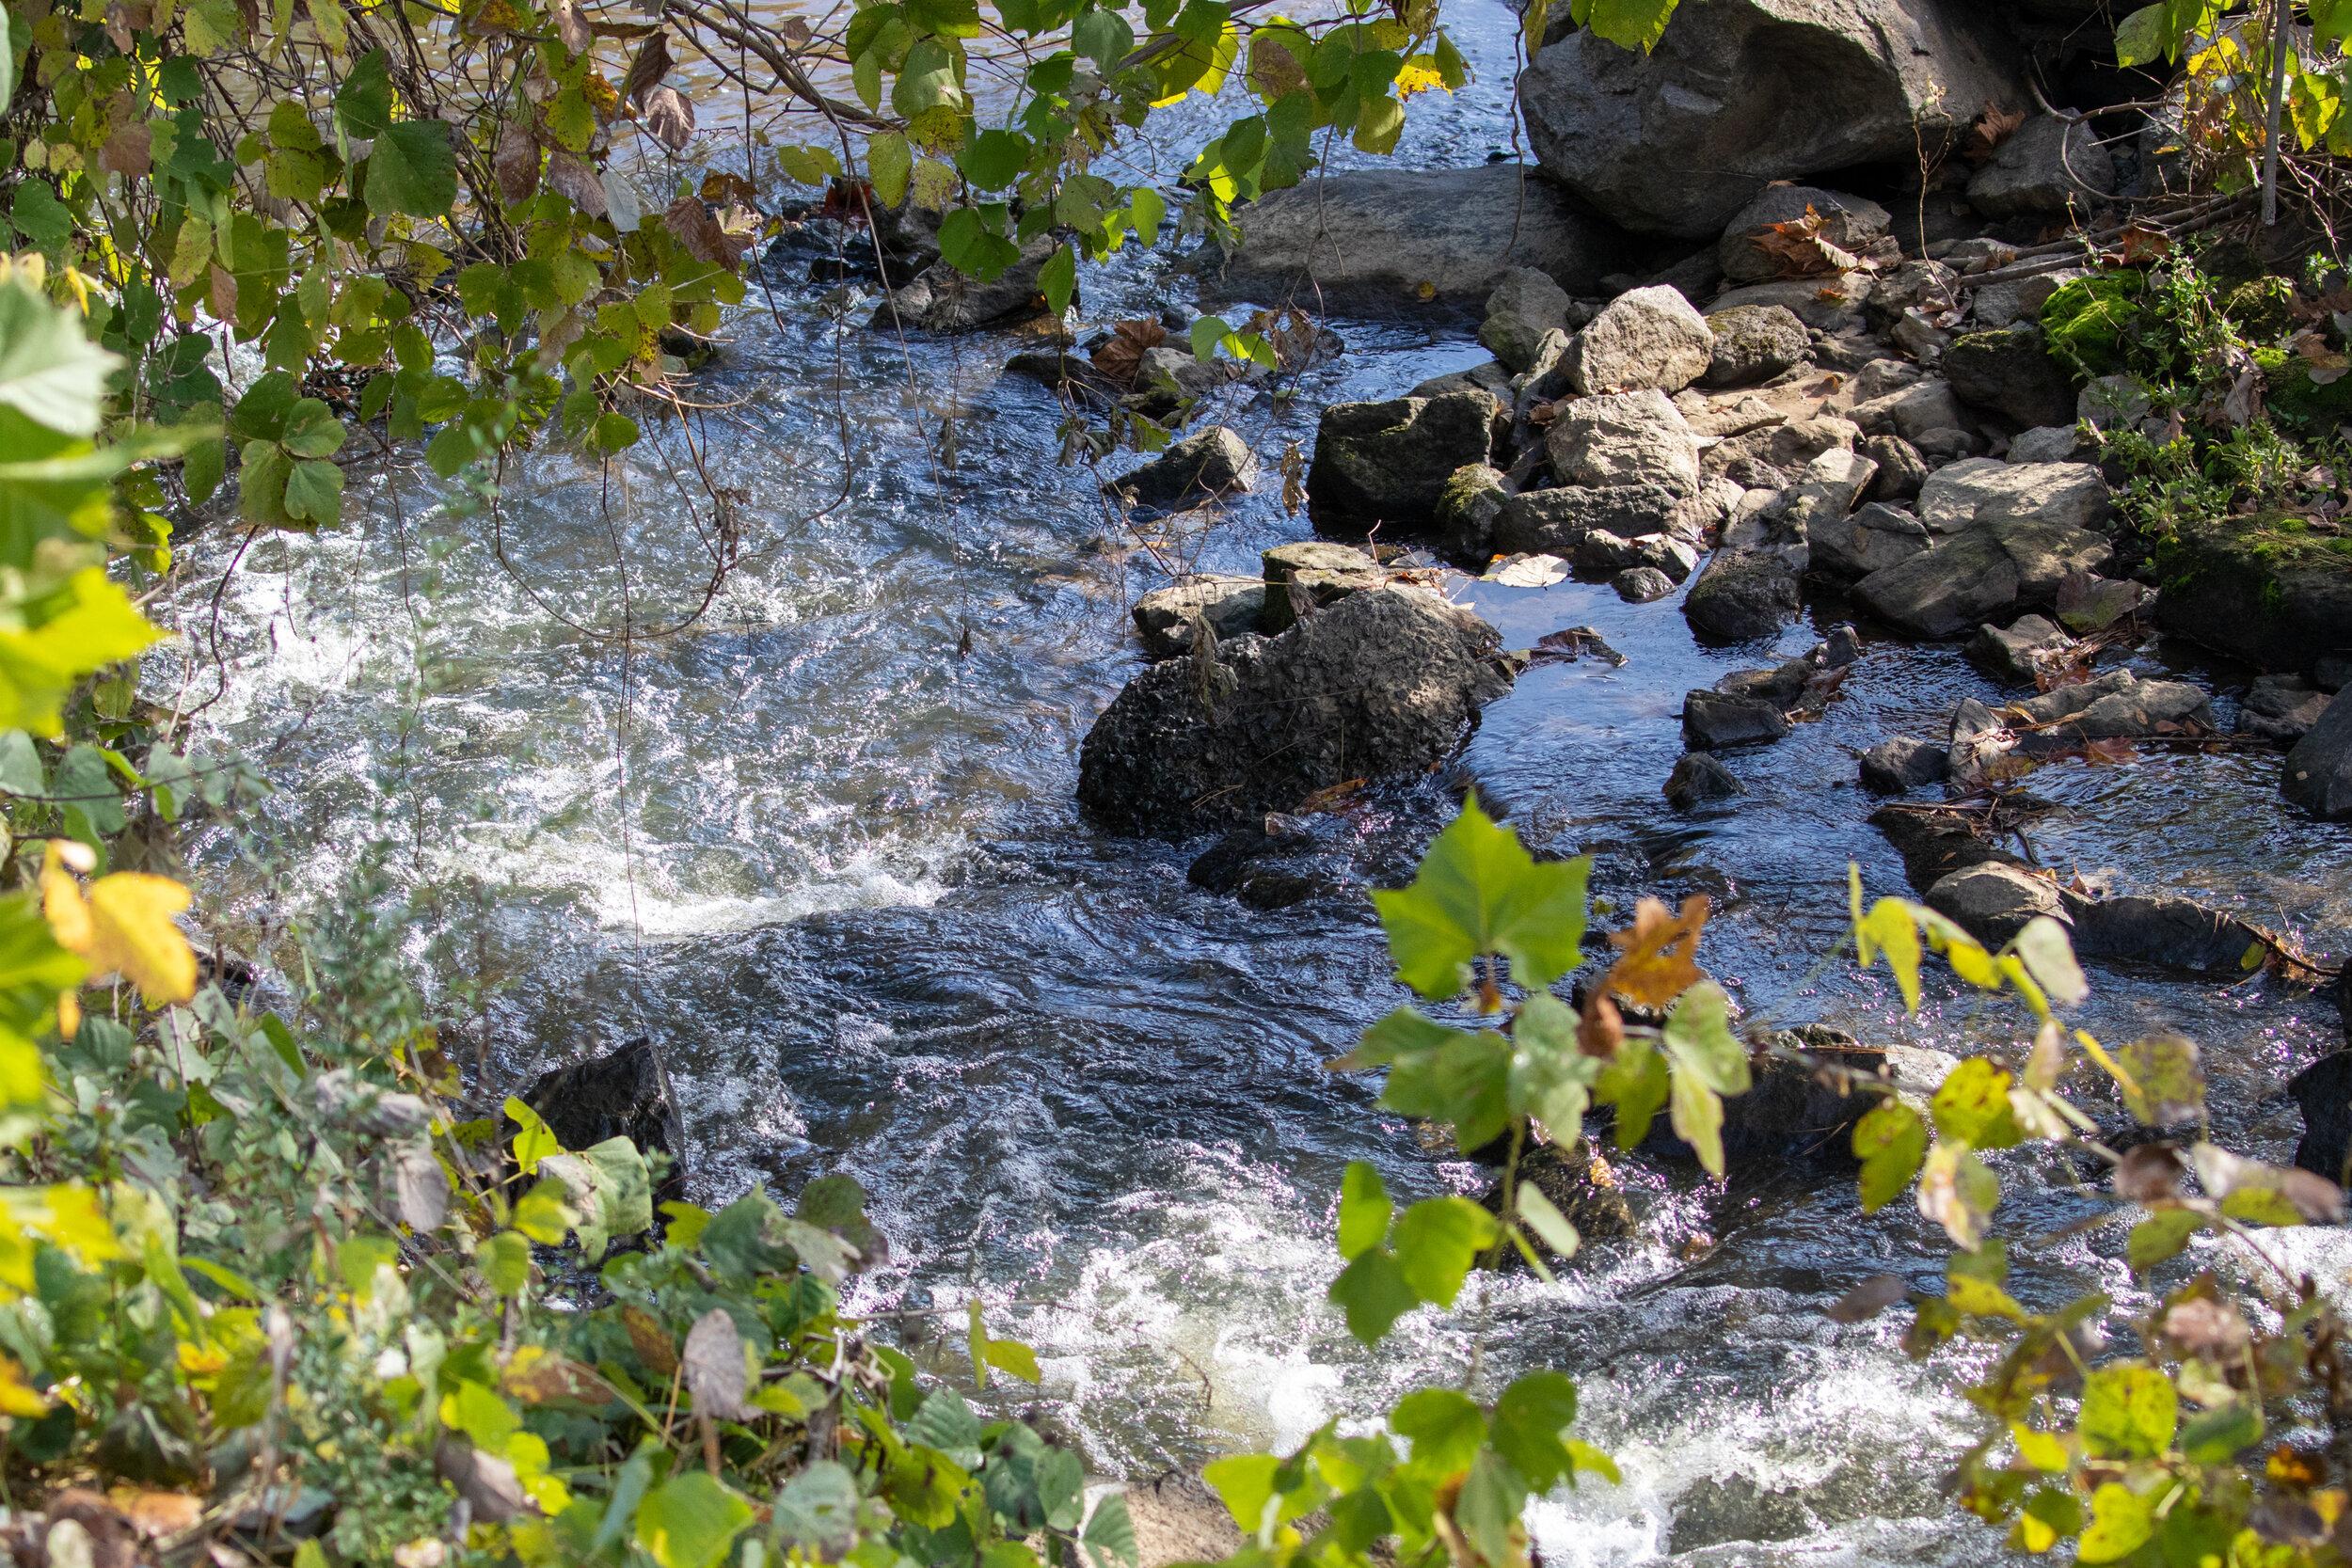 Noonday Creek, November 11, 2019